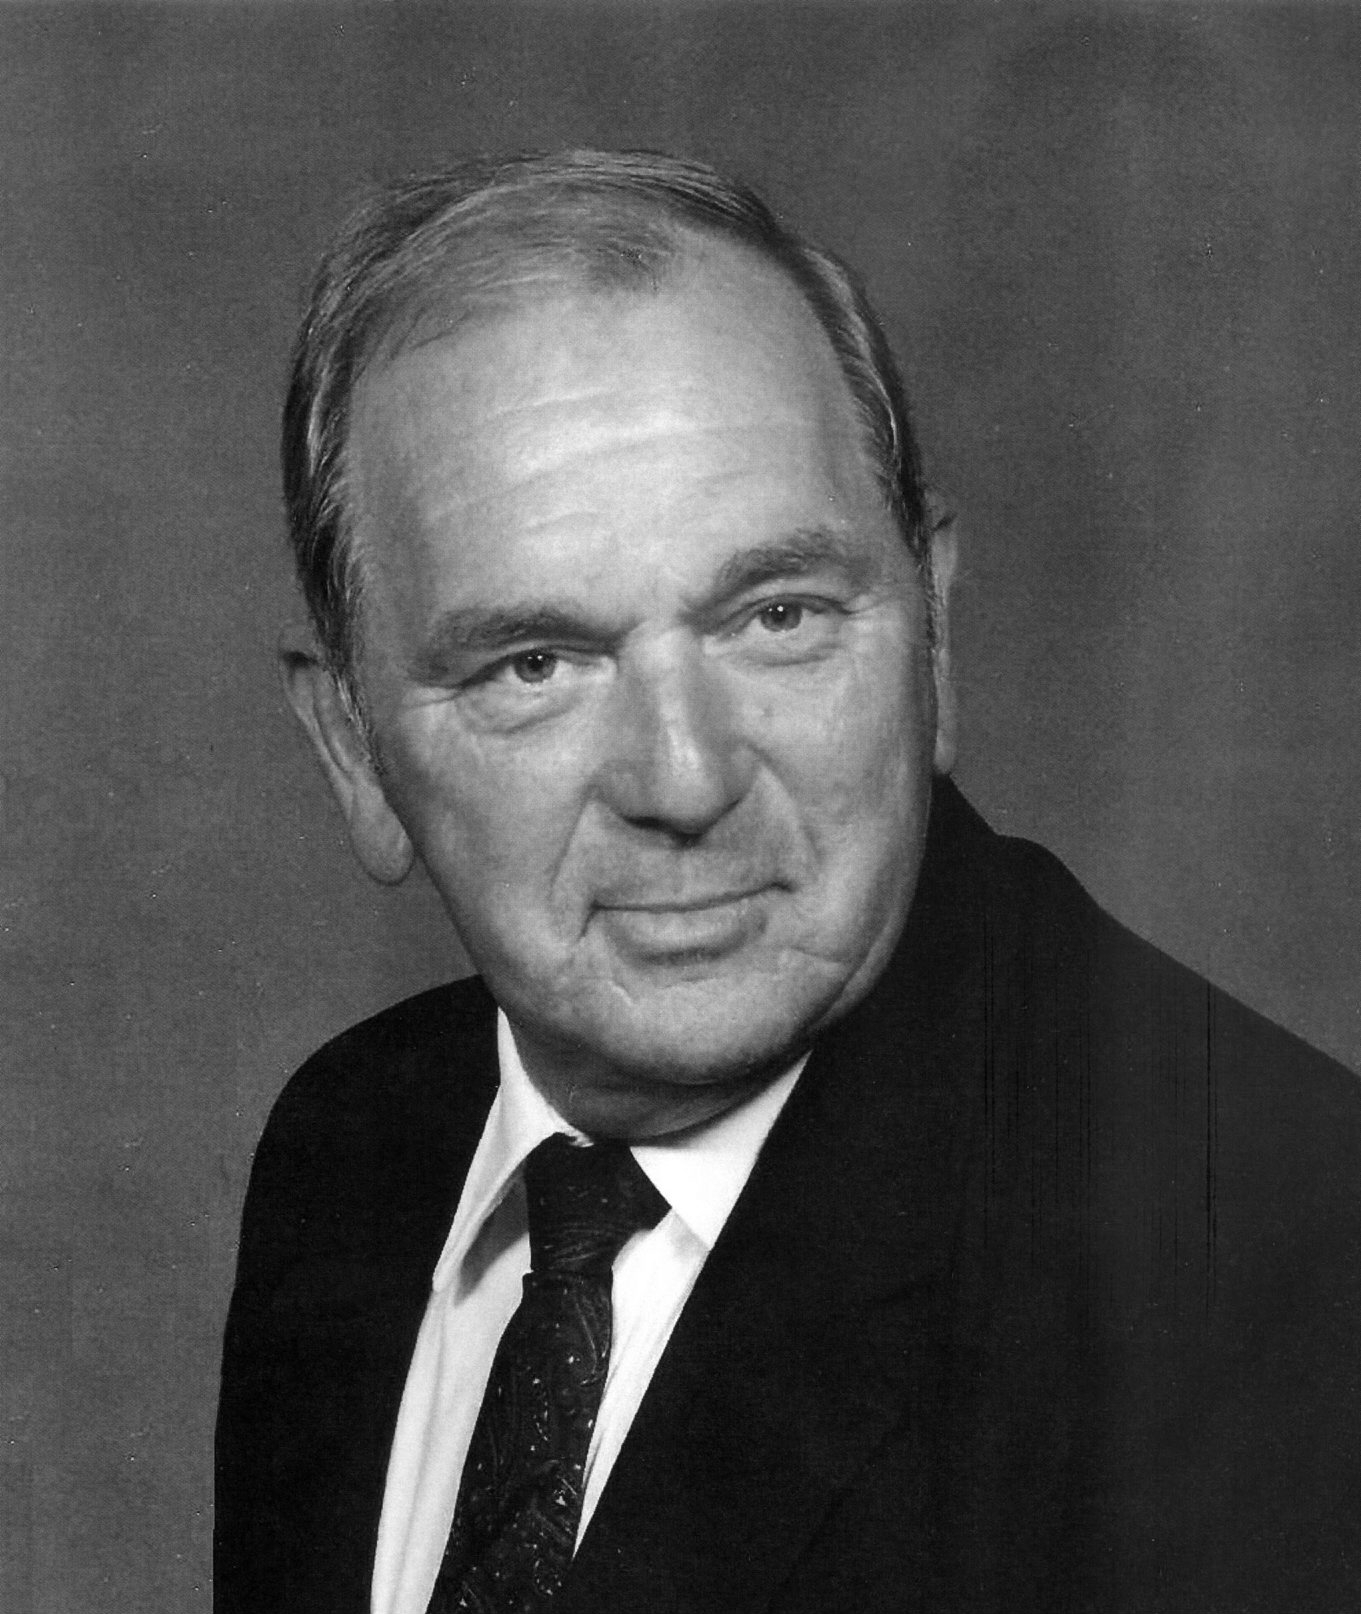 Dennis M. Greene